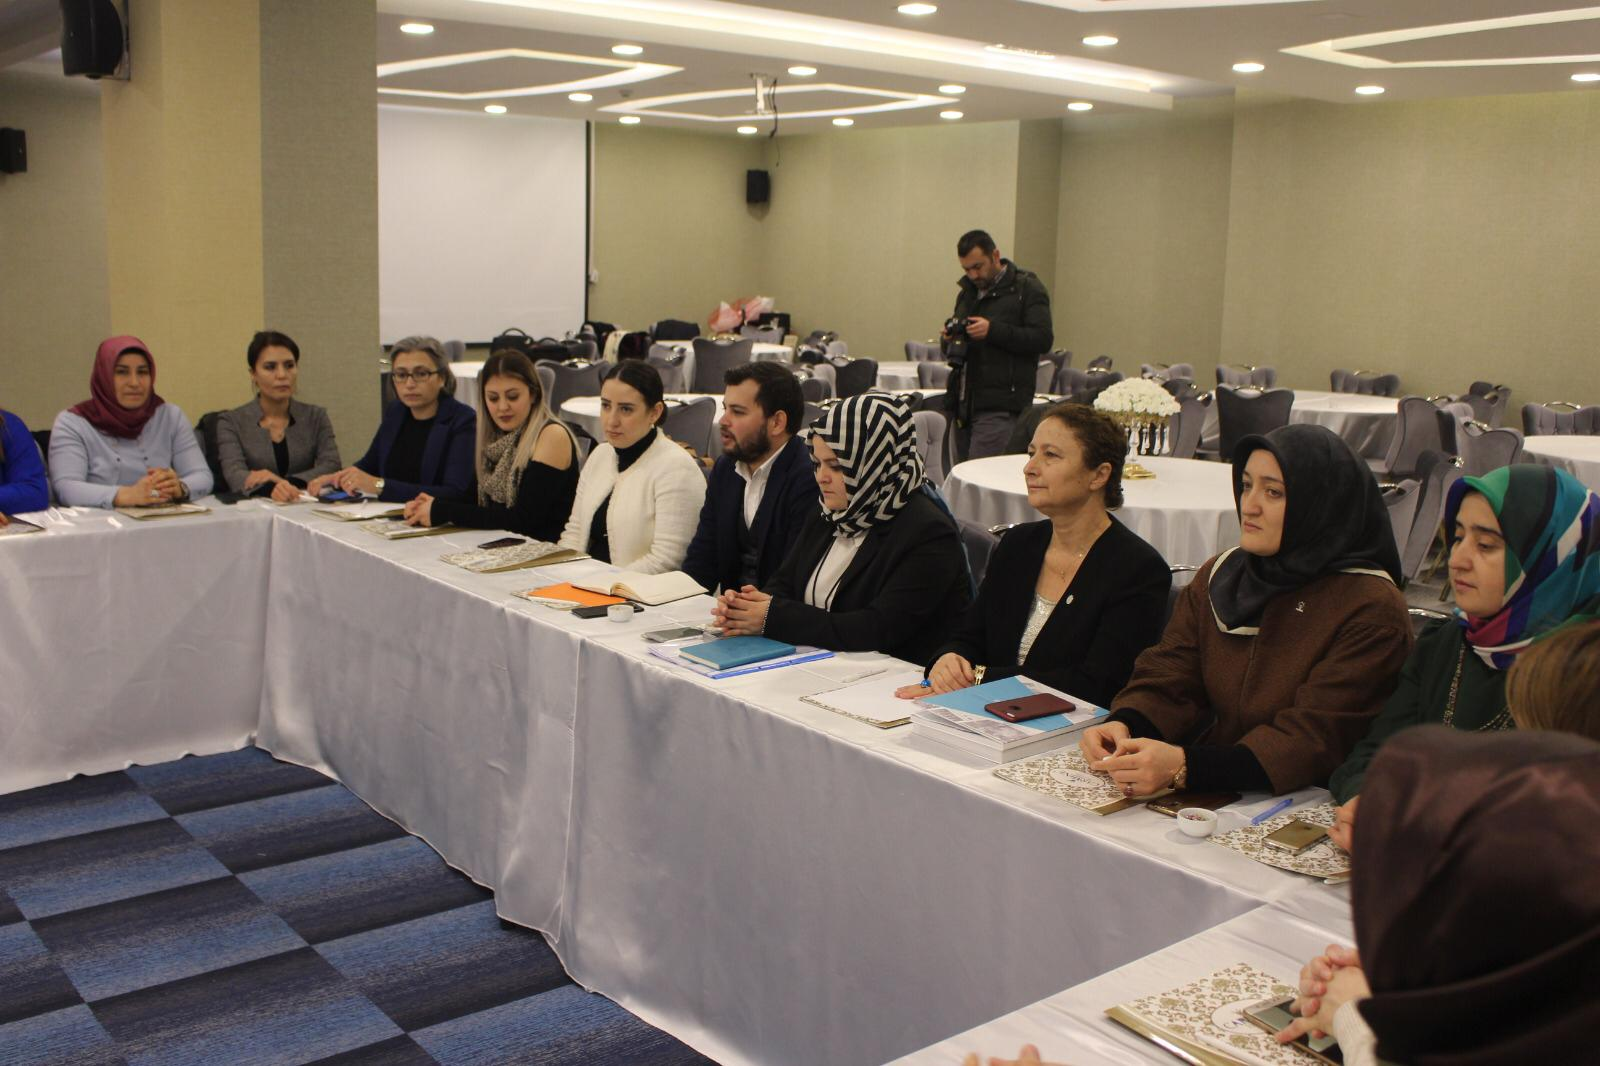 AK Parti Kırıkkale tanıtım medya başkanları seçime hazır 2 - AK Parti Kırıkkale tanıtım medya başkanları seçime hazır